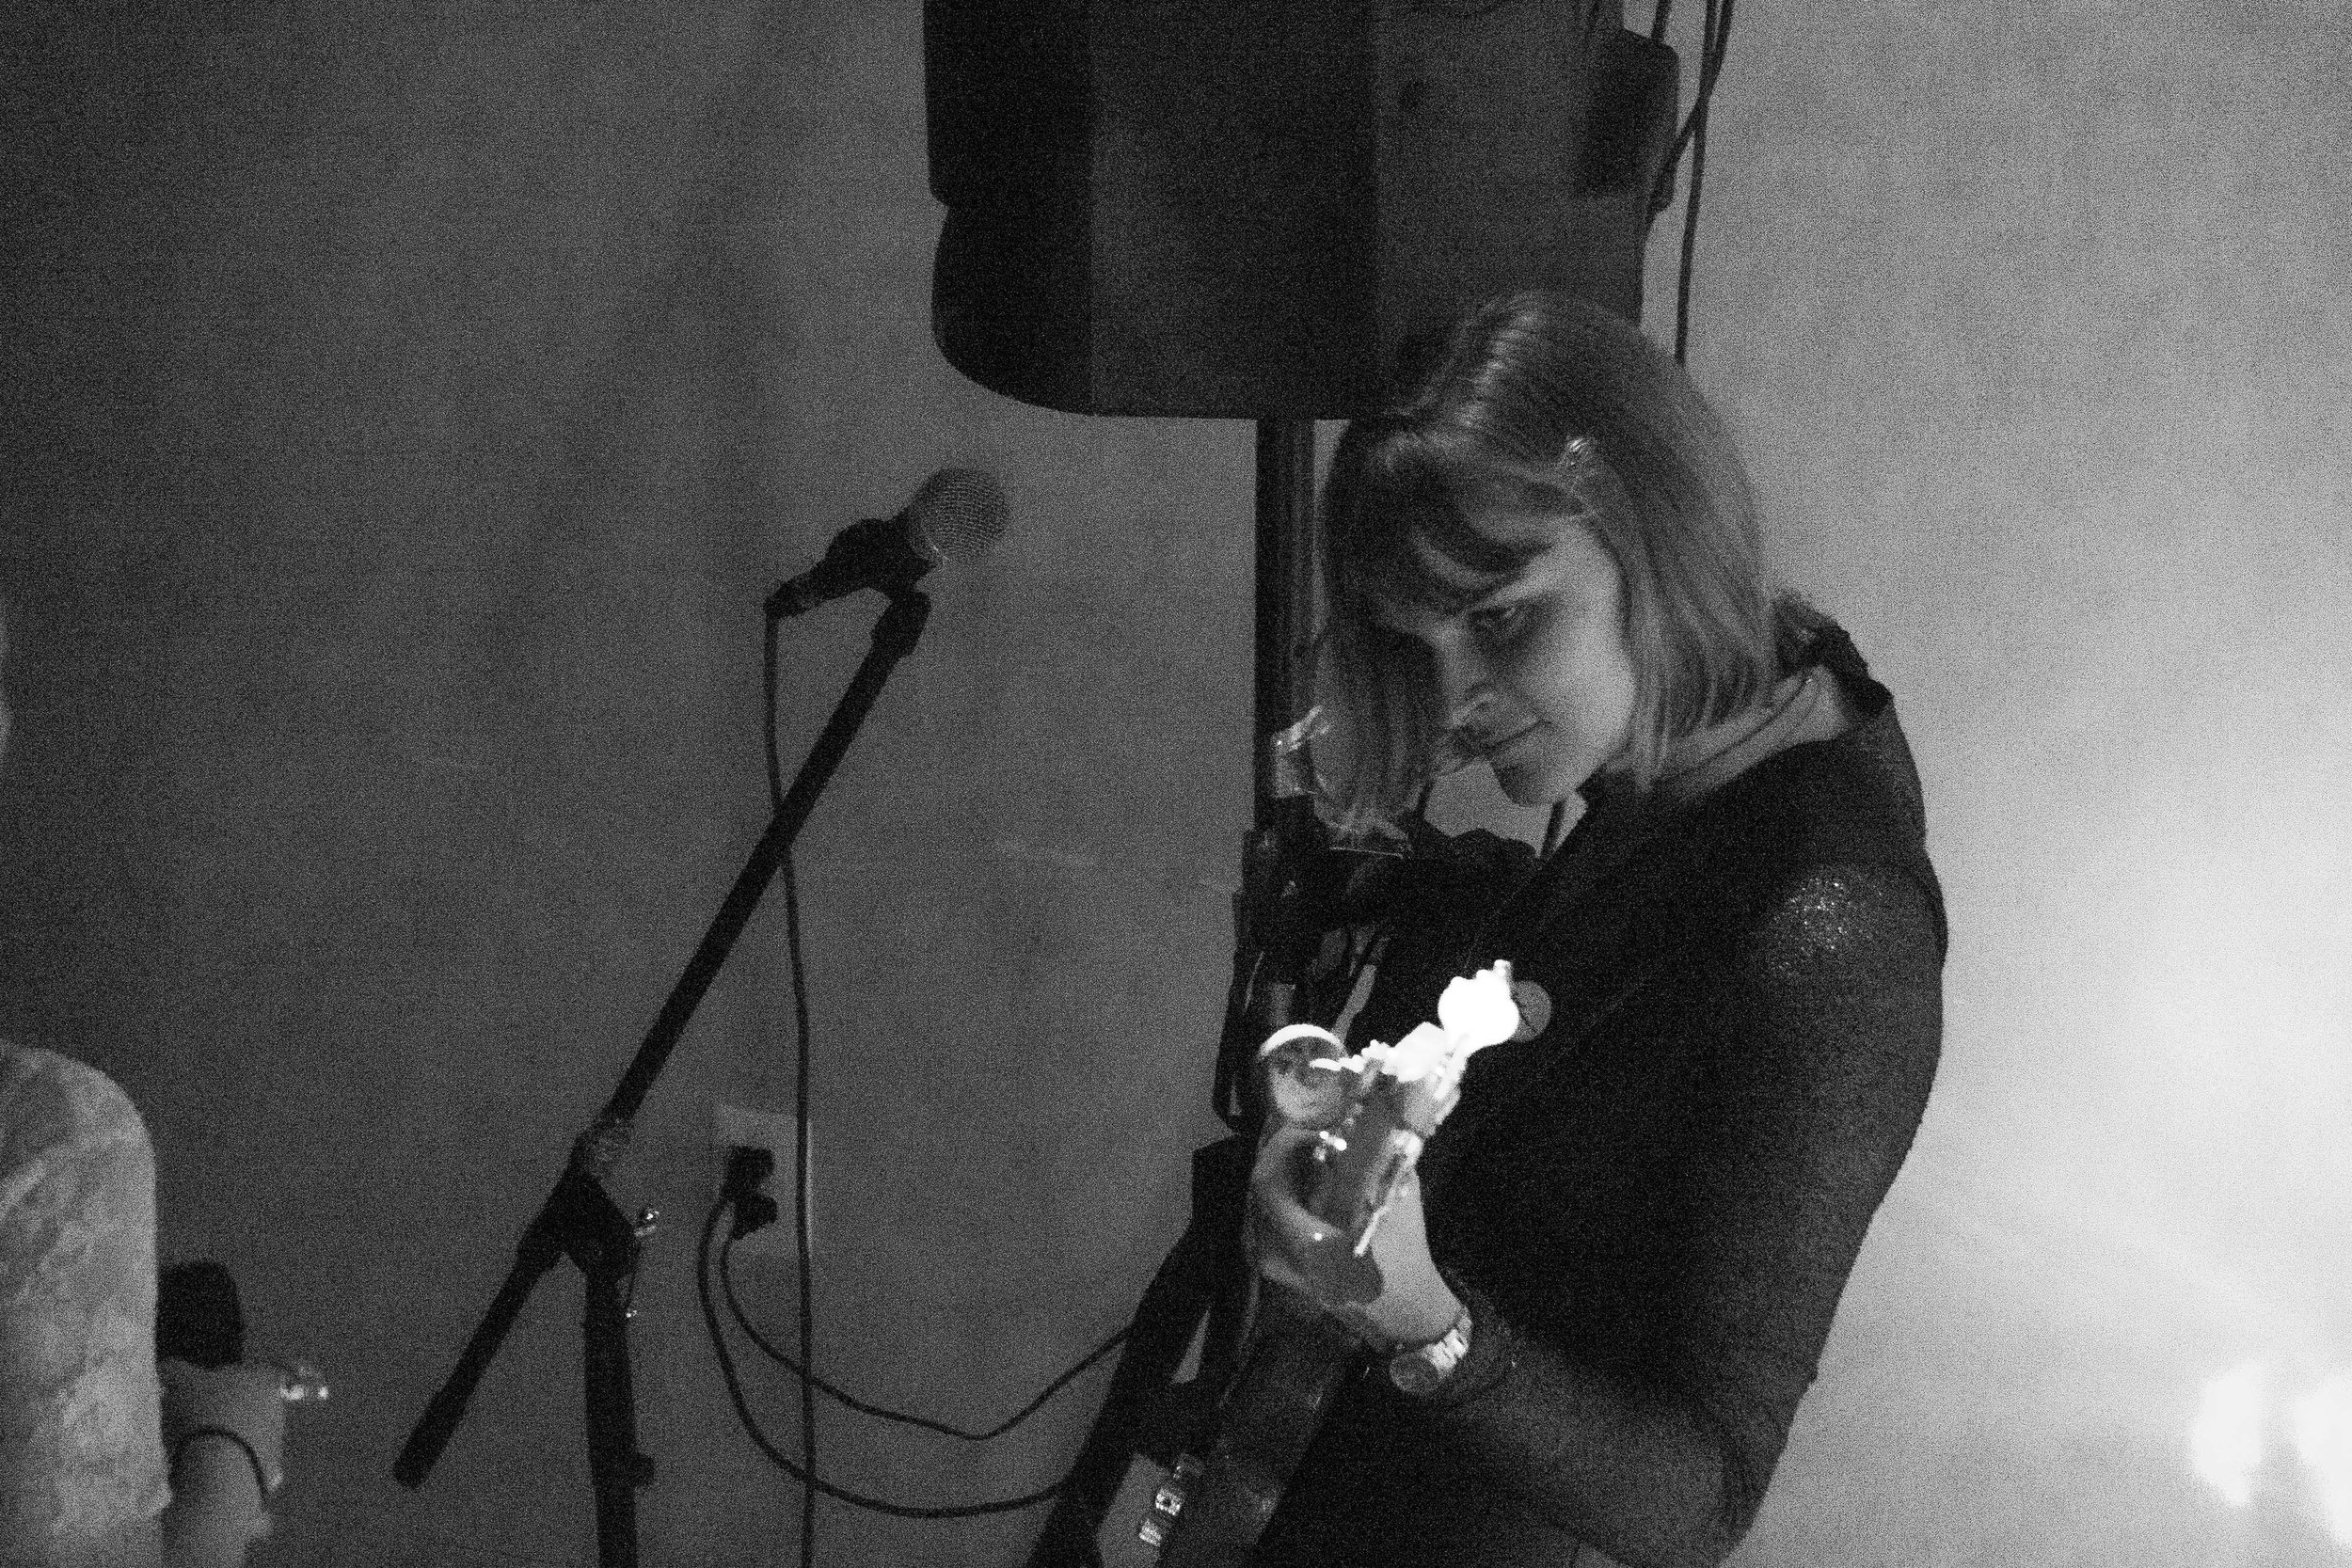 Bassist Lucy Horgan